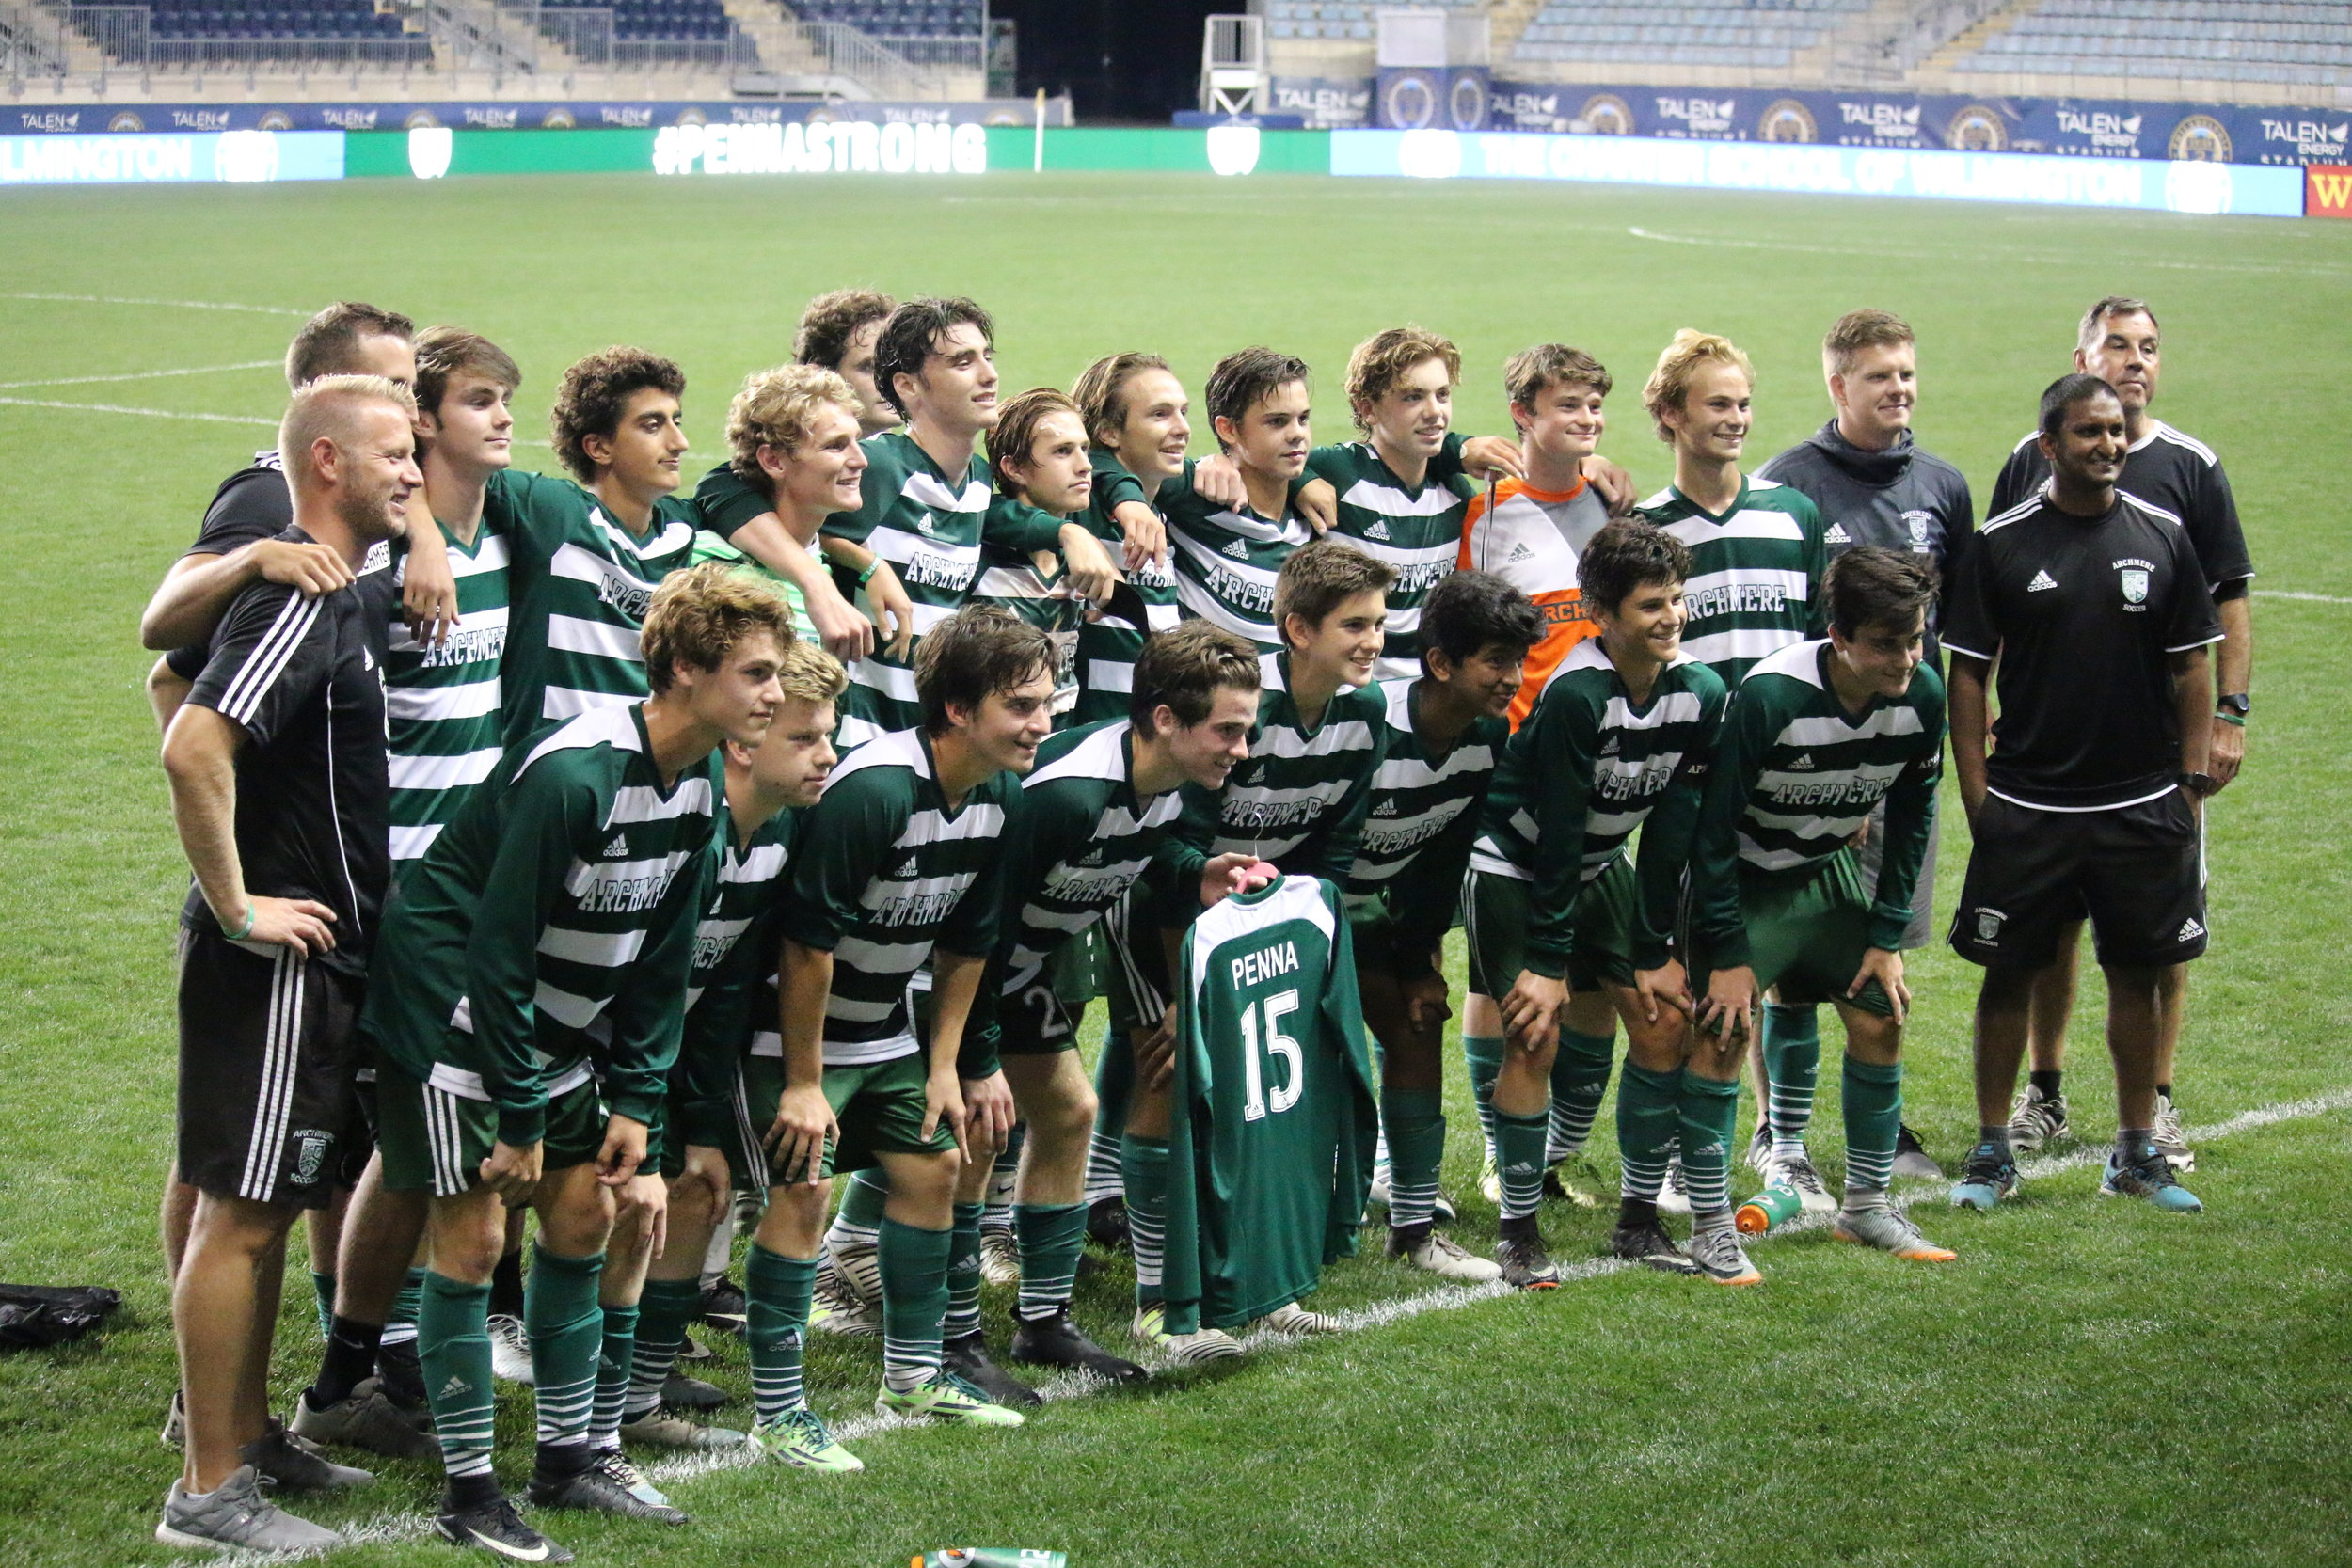 Archmere Varsity Soccer Team at Talen Energy Stadium